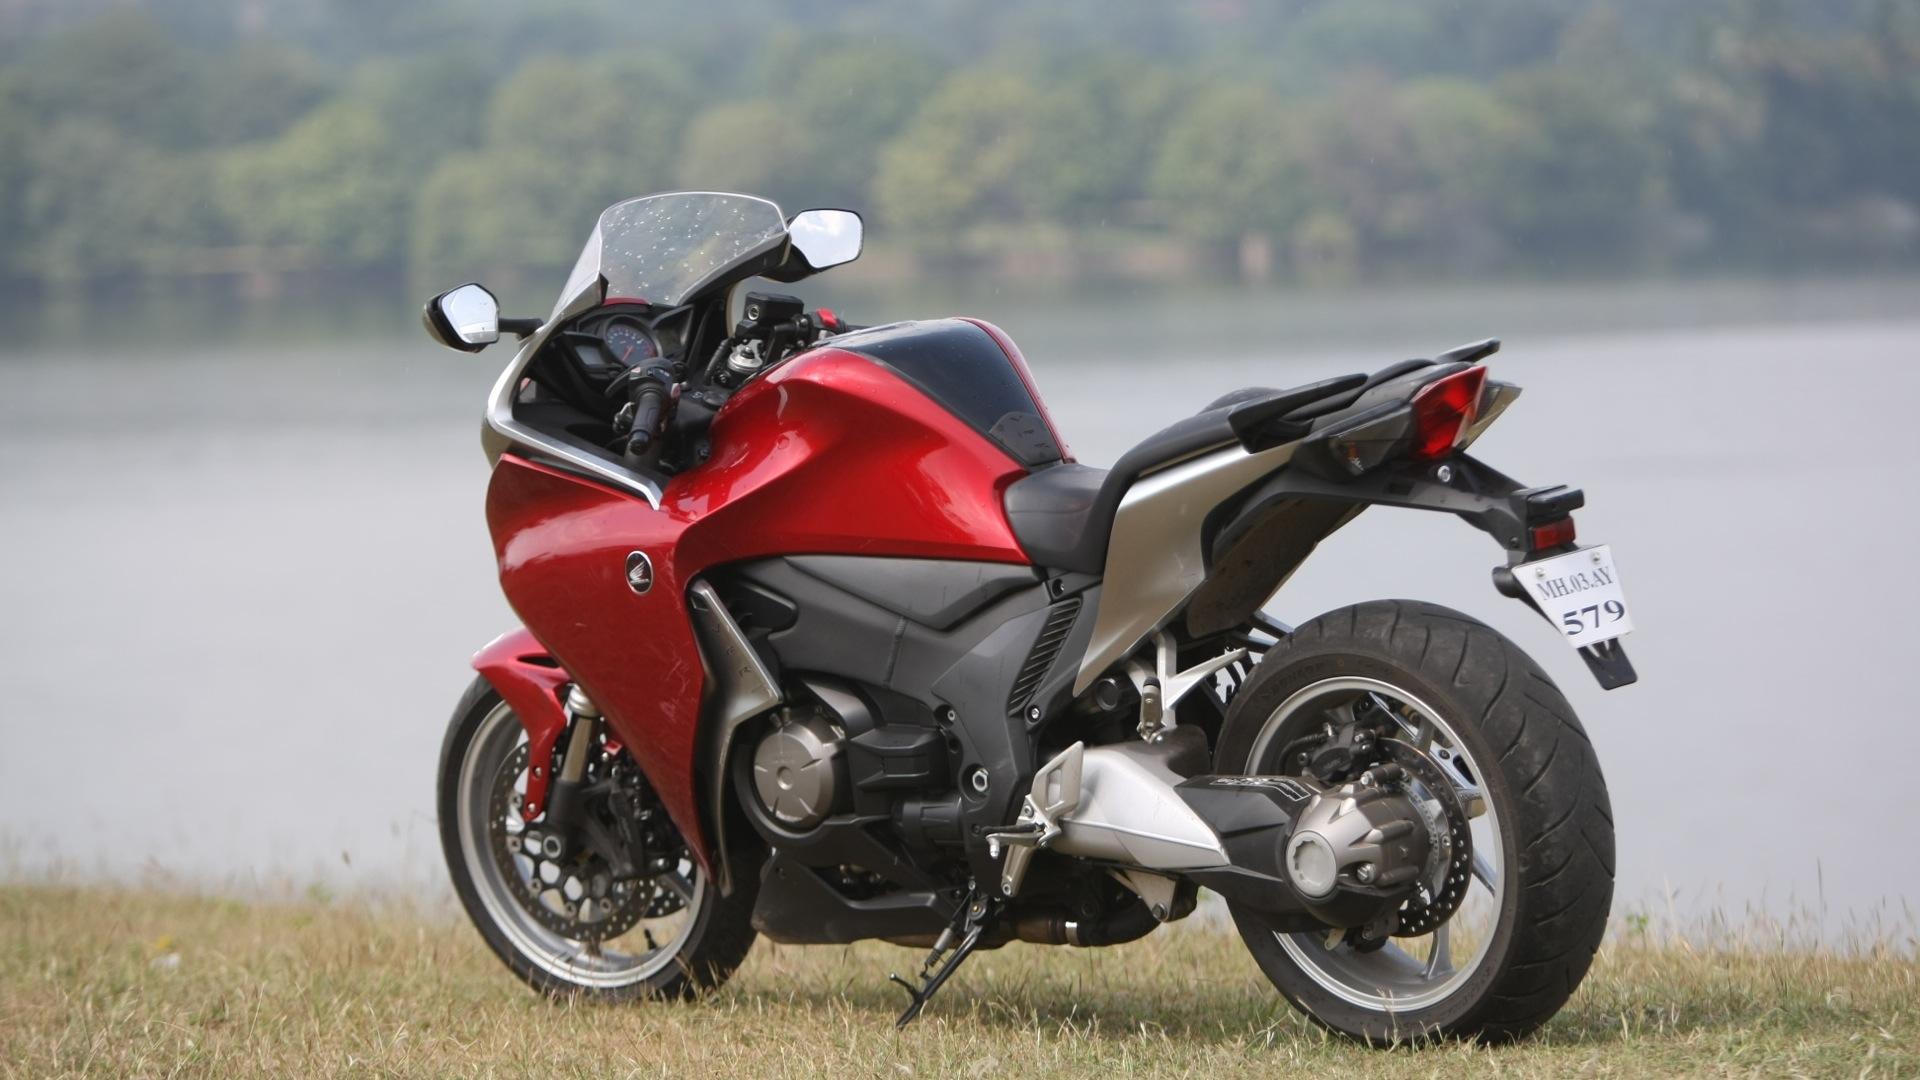 Honda VFR1200F 2013 STD - Price, Mileage, Reviews ...